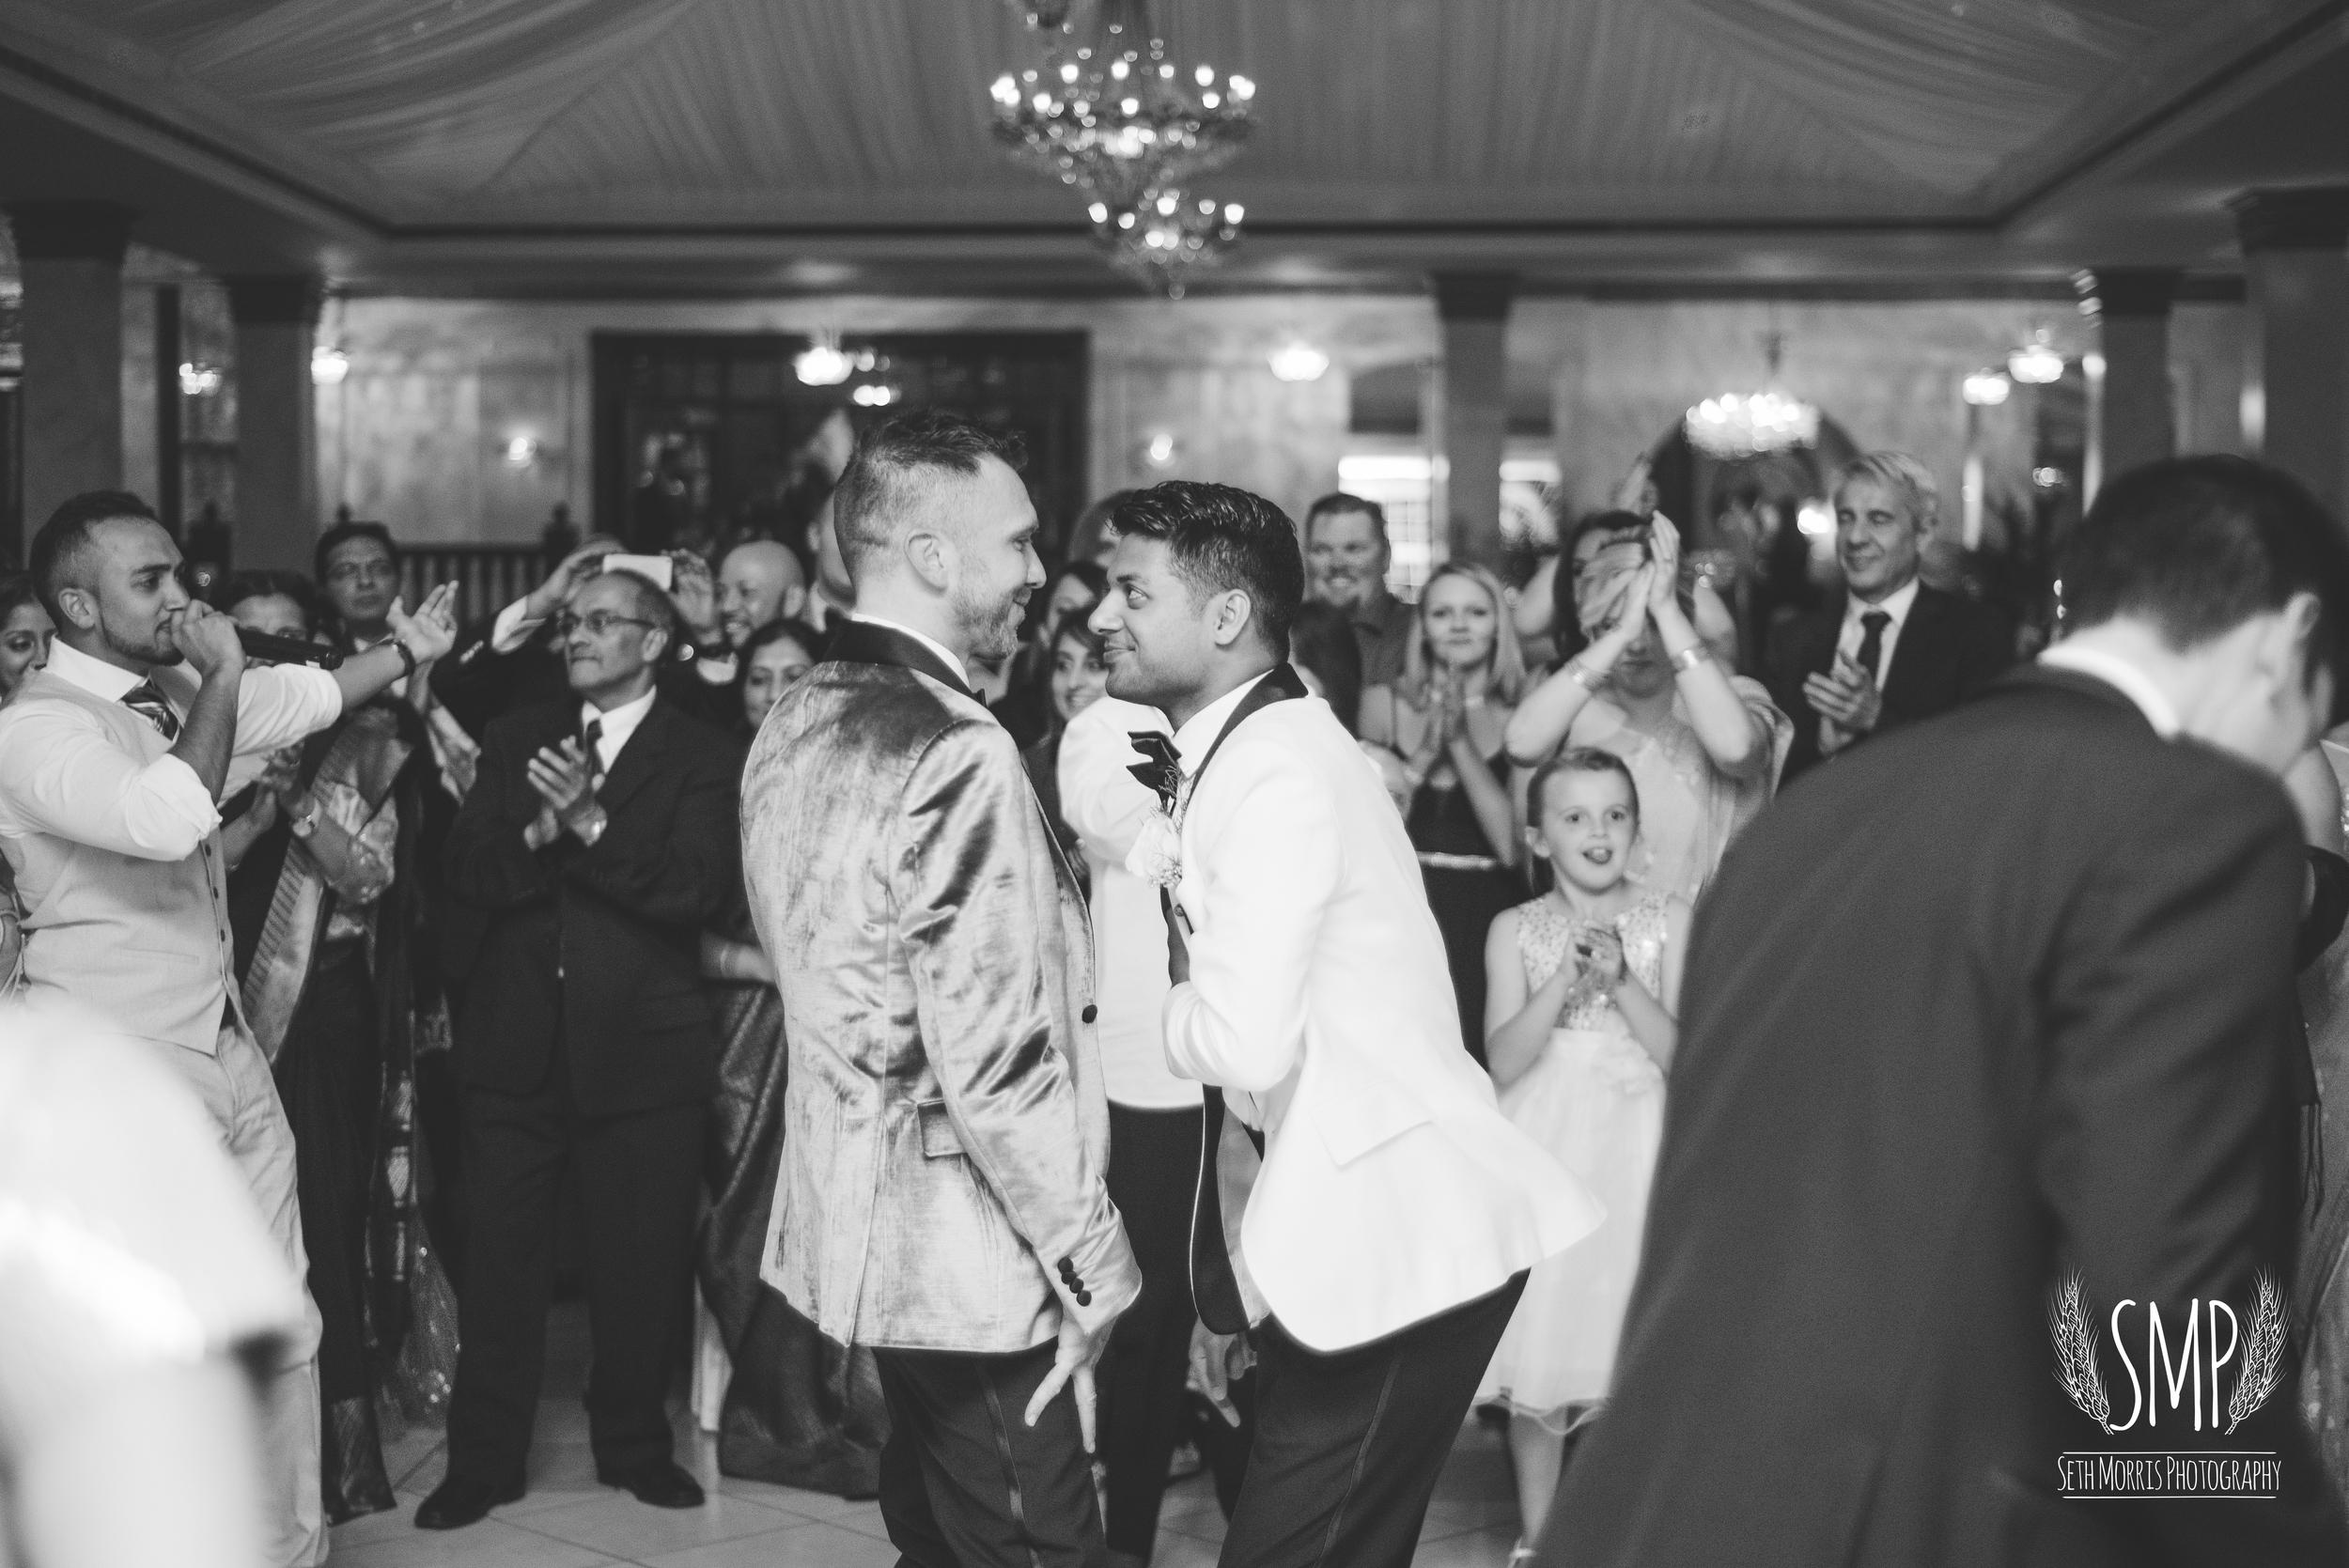 same-sex-wedding-photographer-chicago-illinois-113.jpg